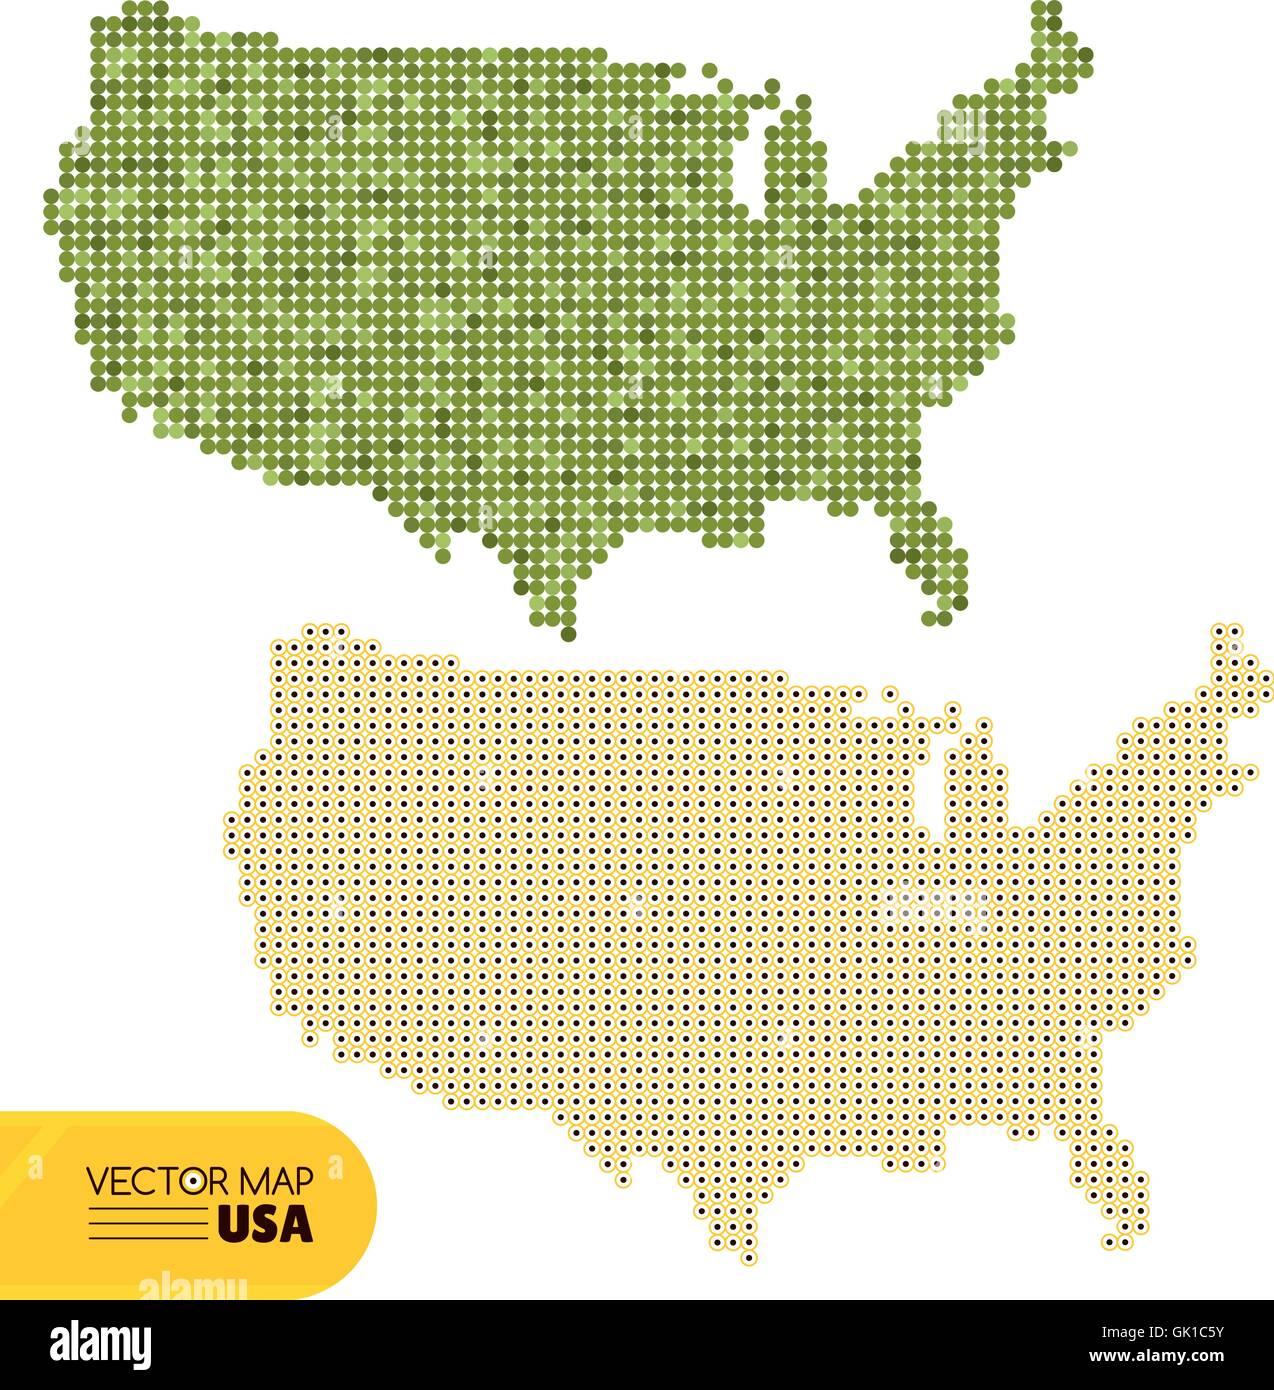 Usa Map Stock Vector Images Alamy - Map usa vector